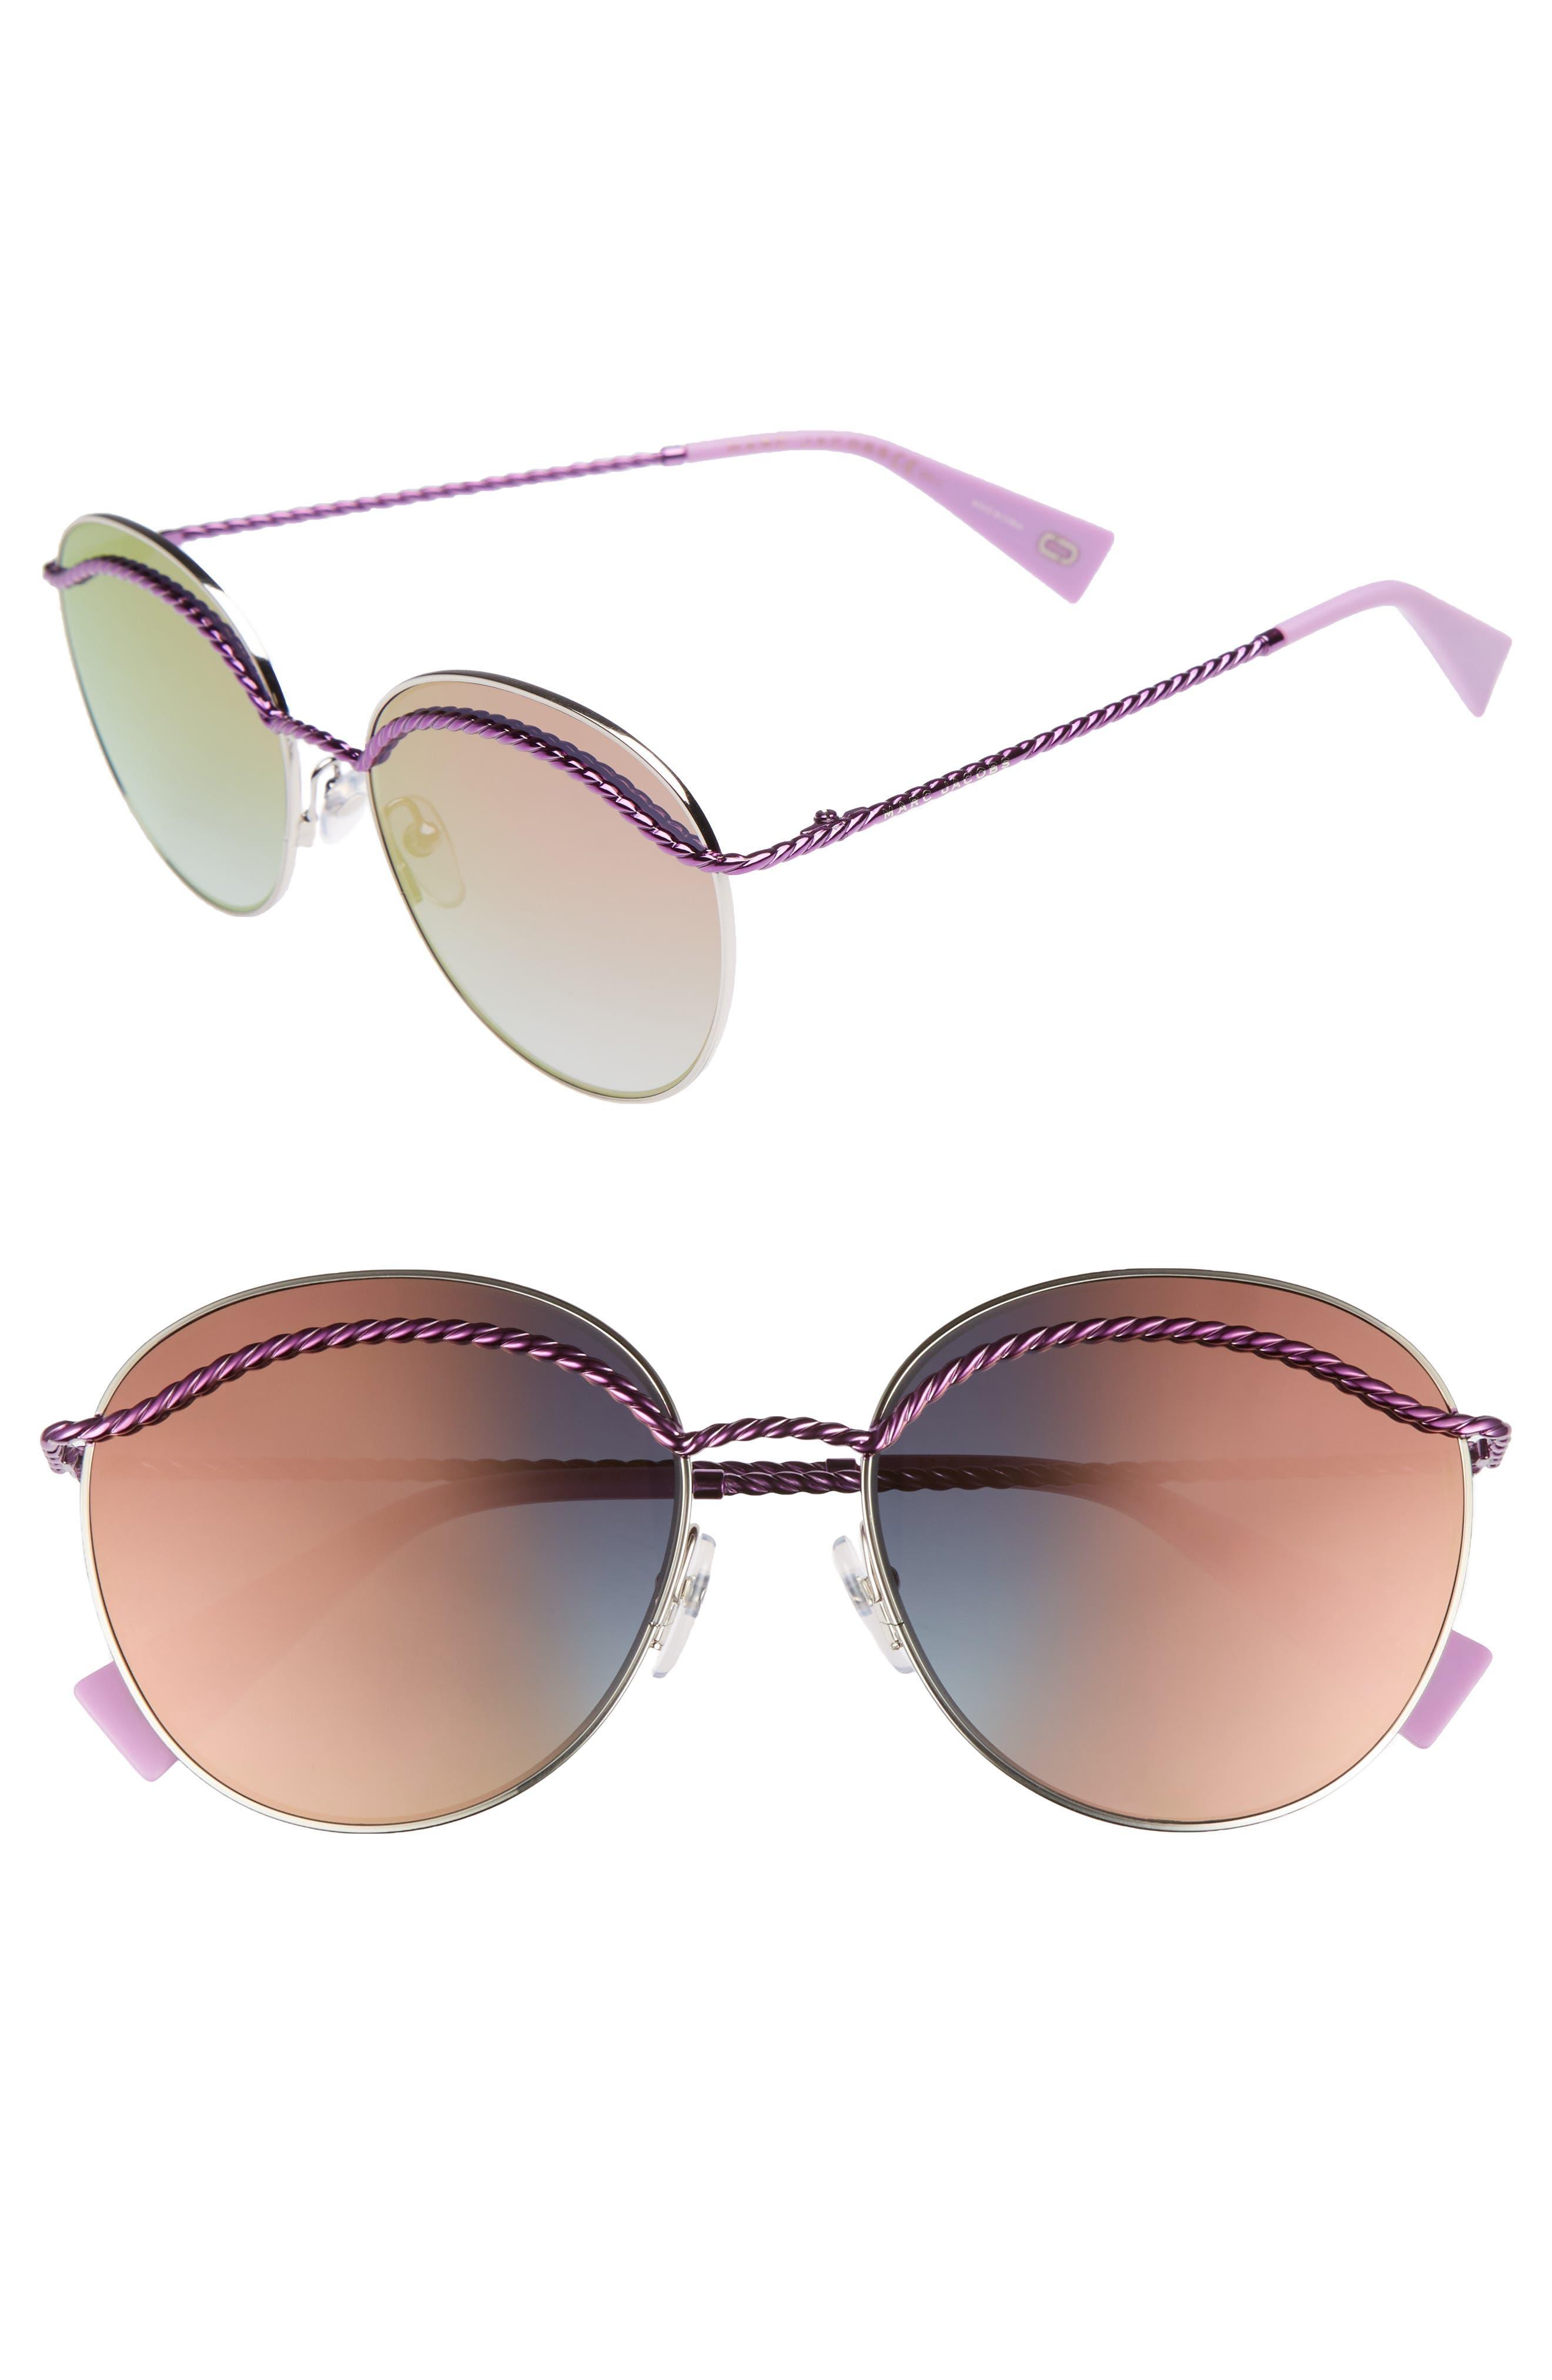 58mm Round Sunglasses,                             Main thumbnail 1, color,                             MATTE MAGENTA